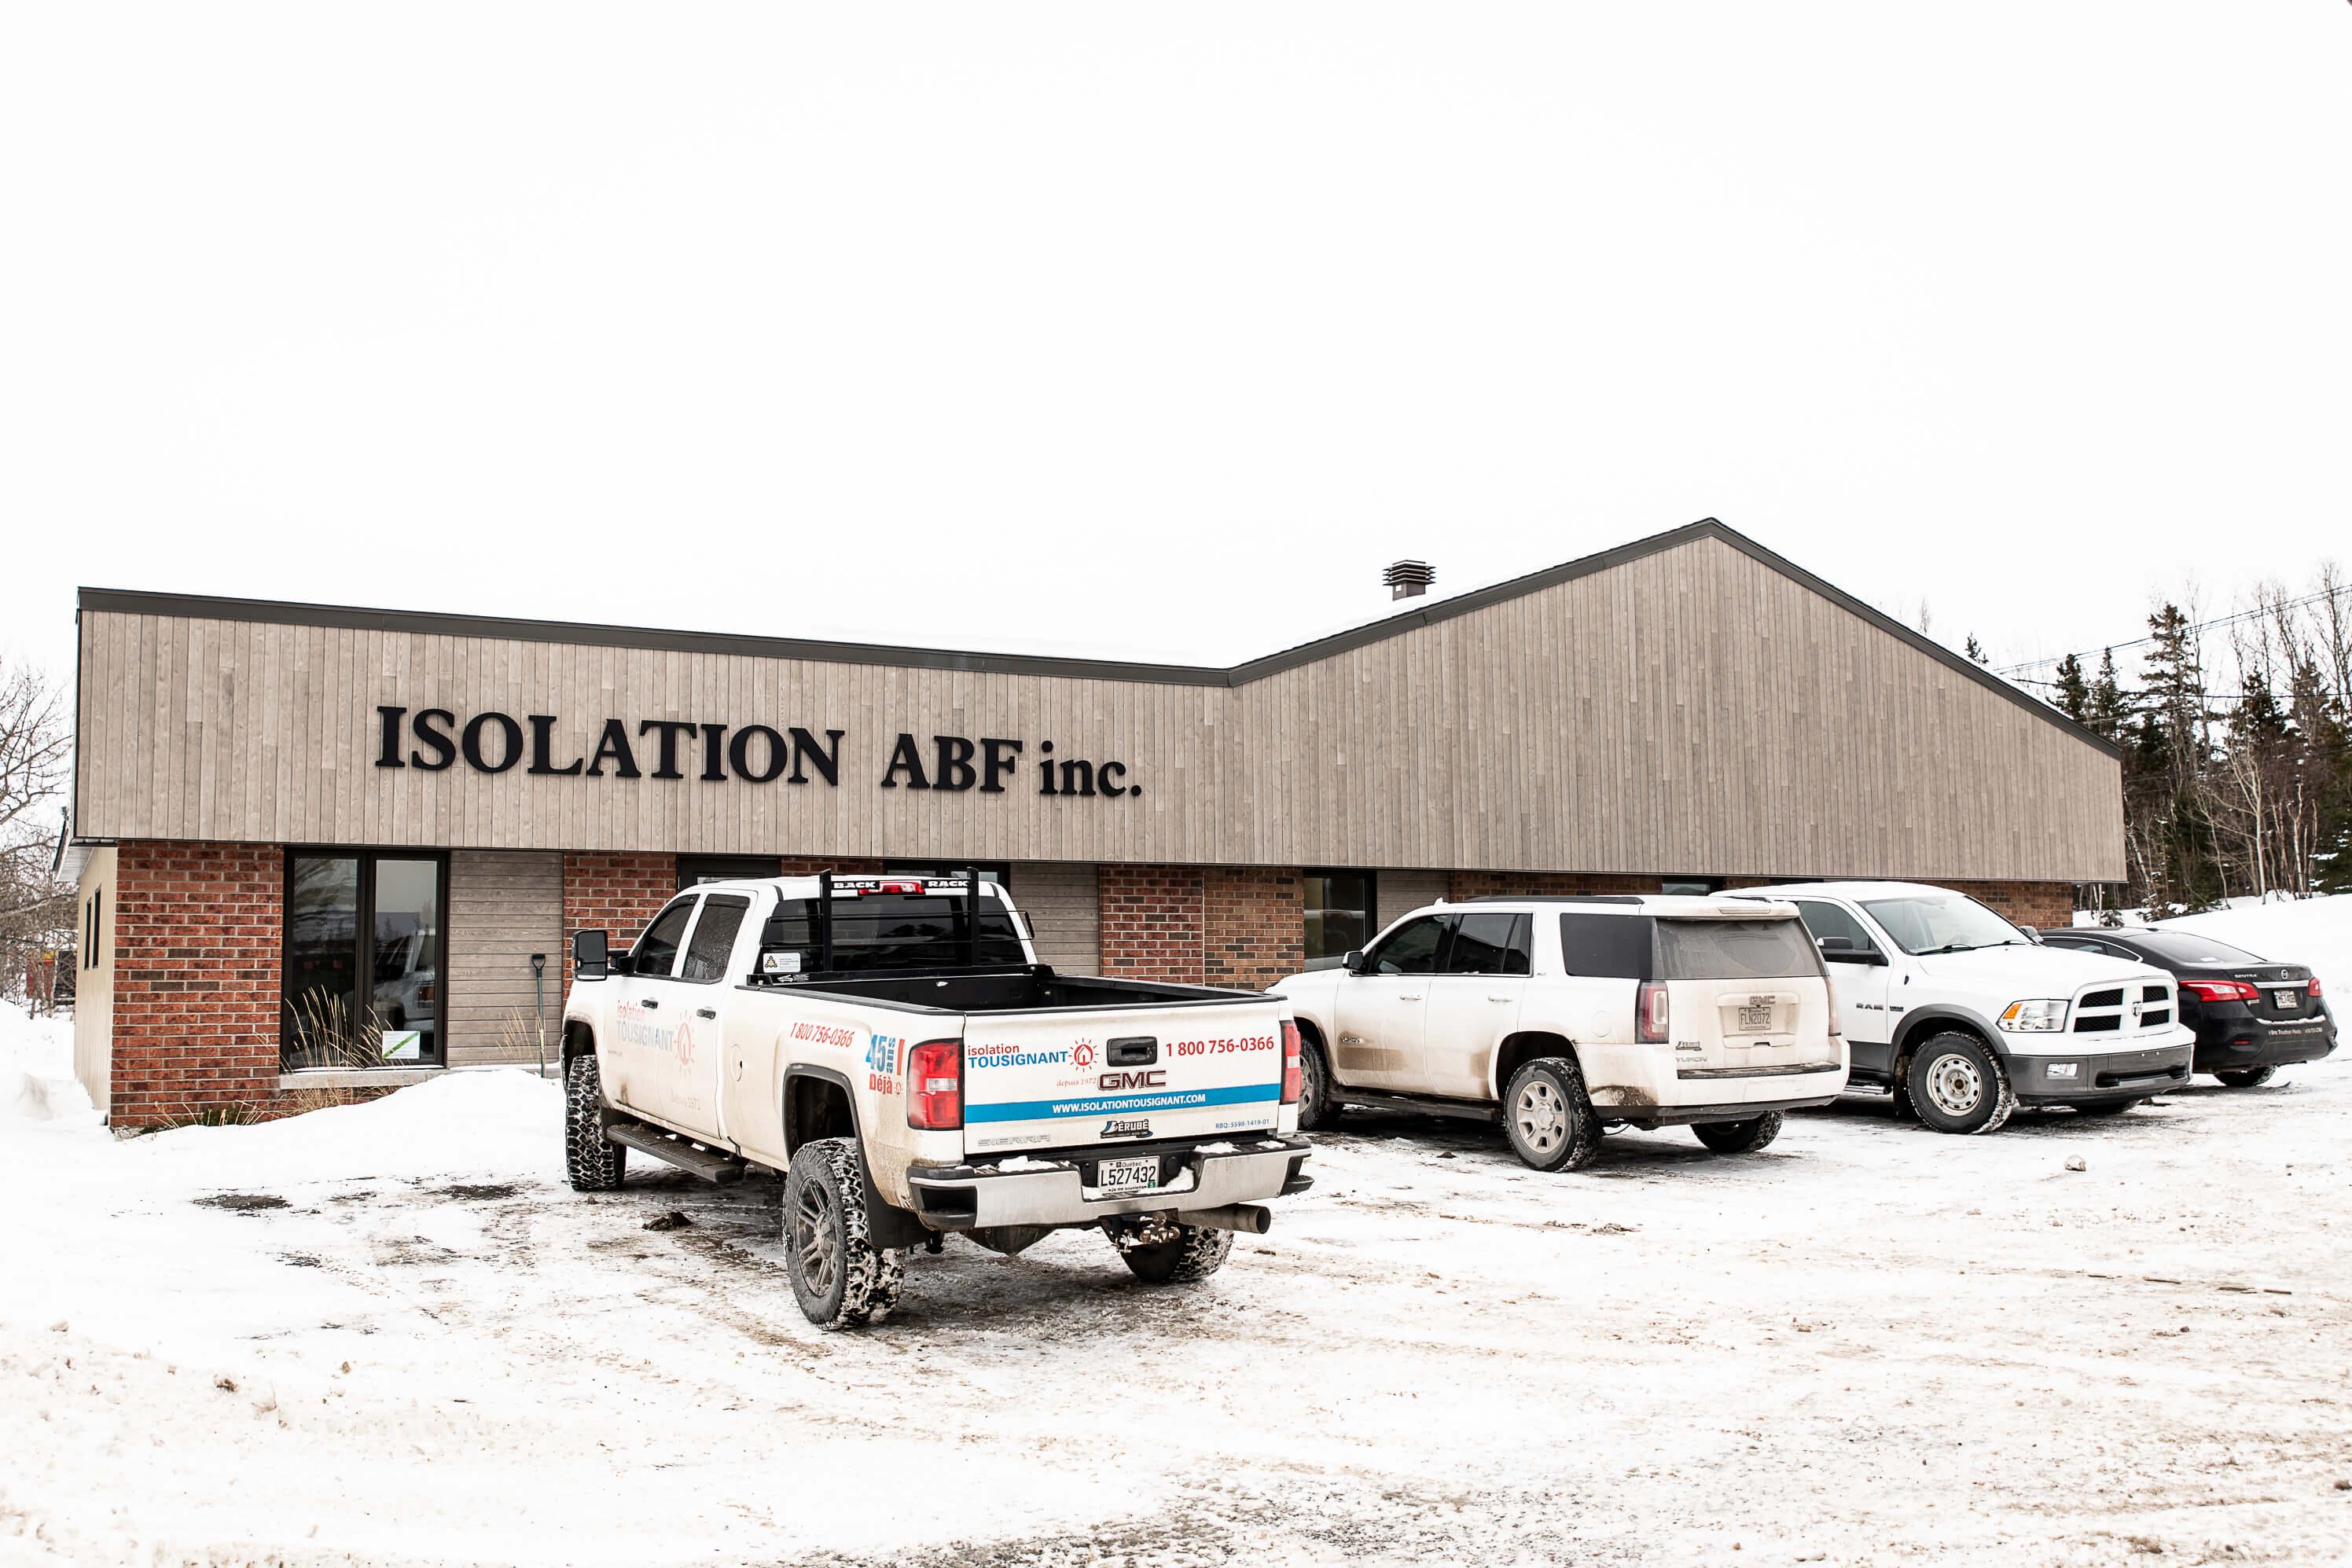 Isolation A.B.F